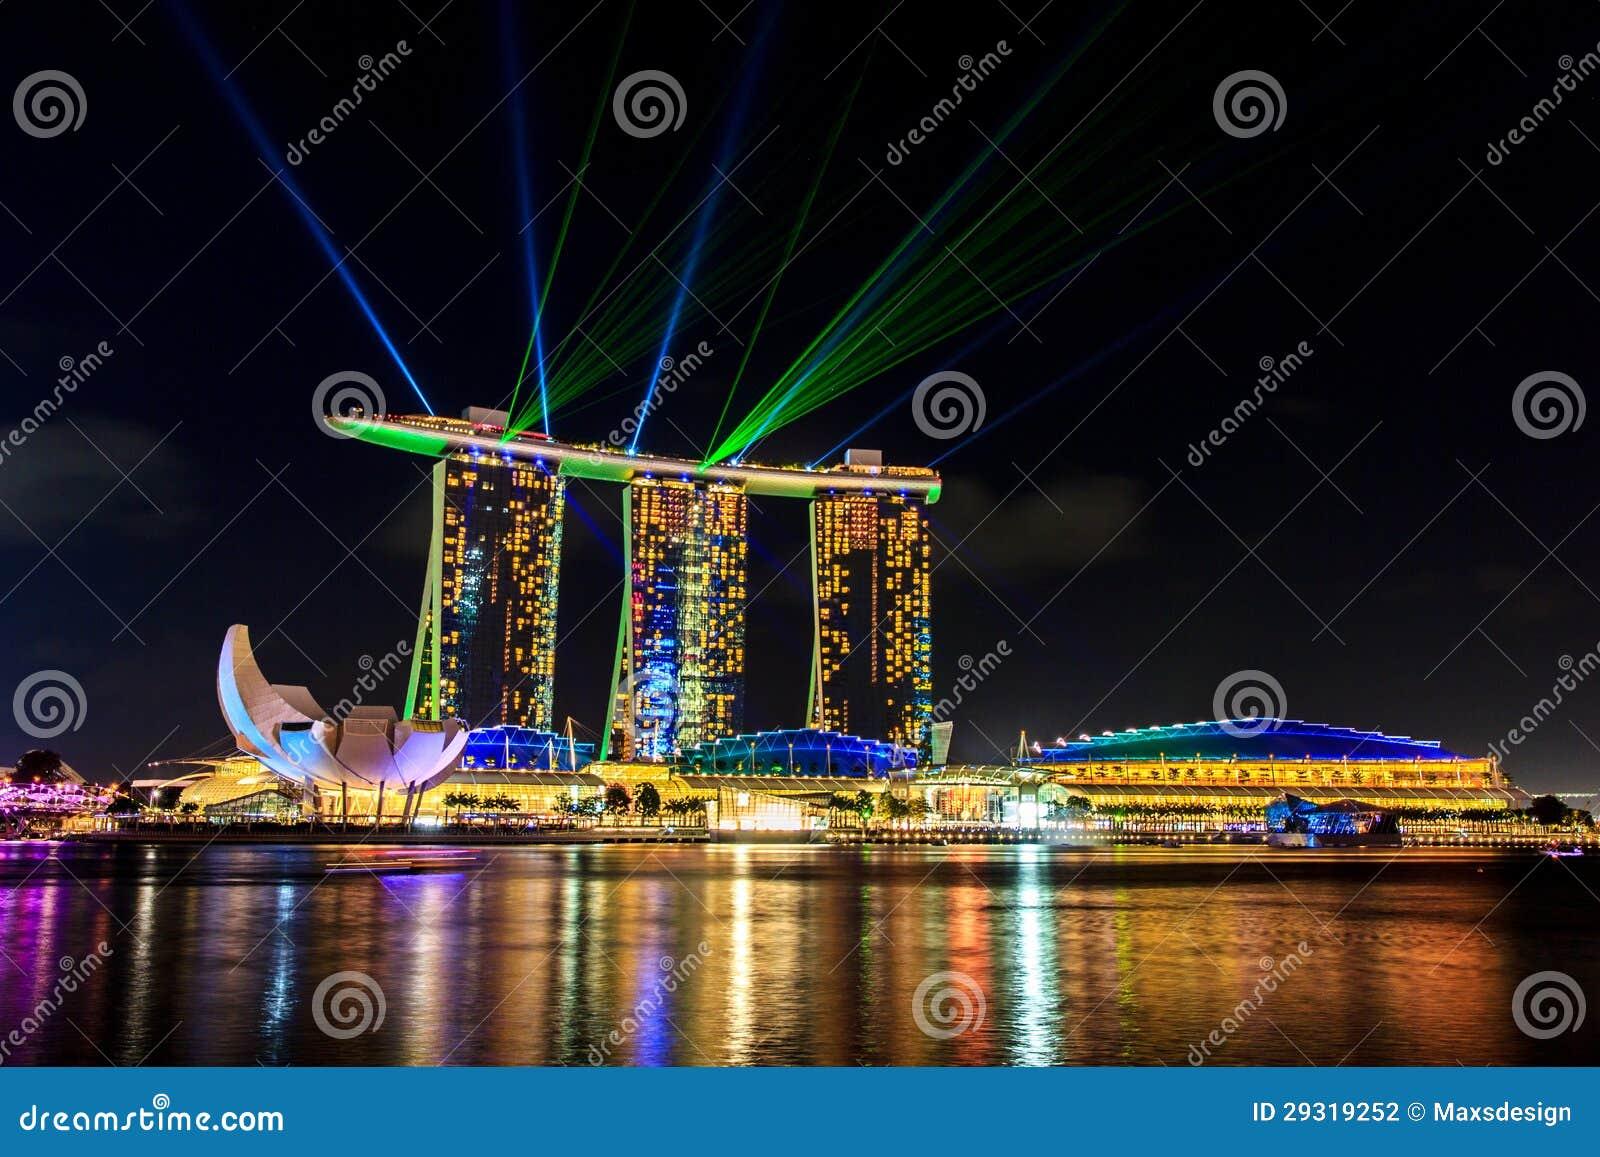 Laser Show Marina Bay Sands Singapore